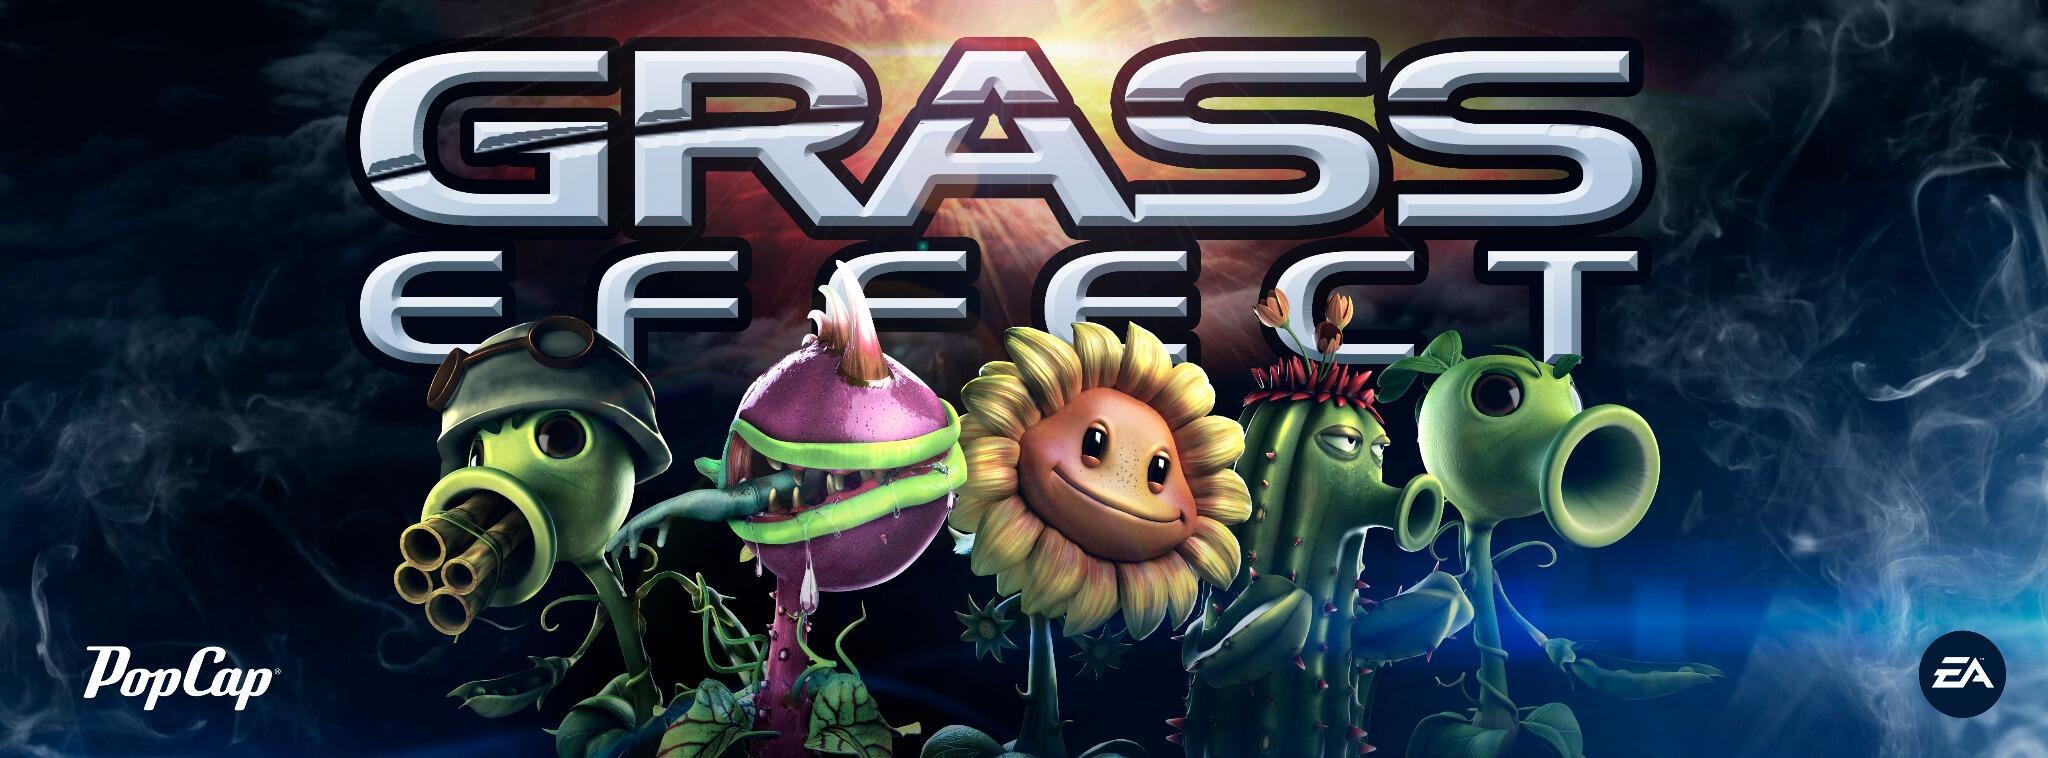 RT @EA: Plants vs. … Reapers? #EAE3 http://t.co/IeQdZbG6tO